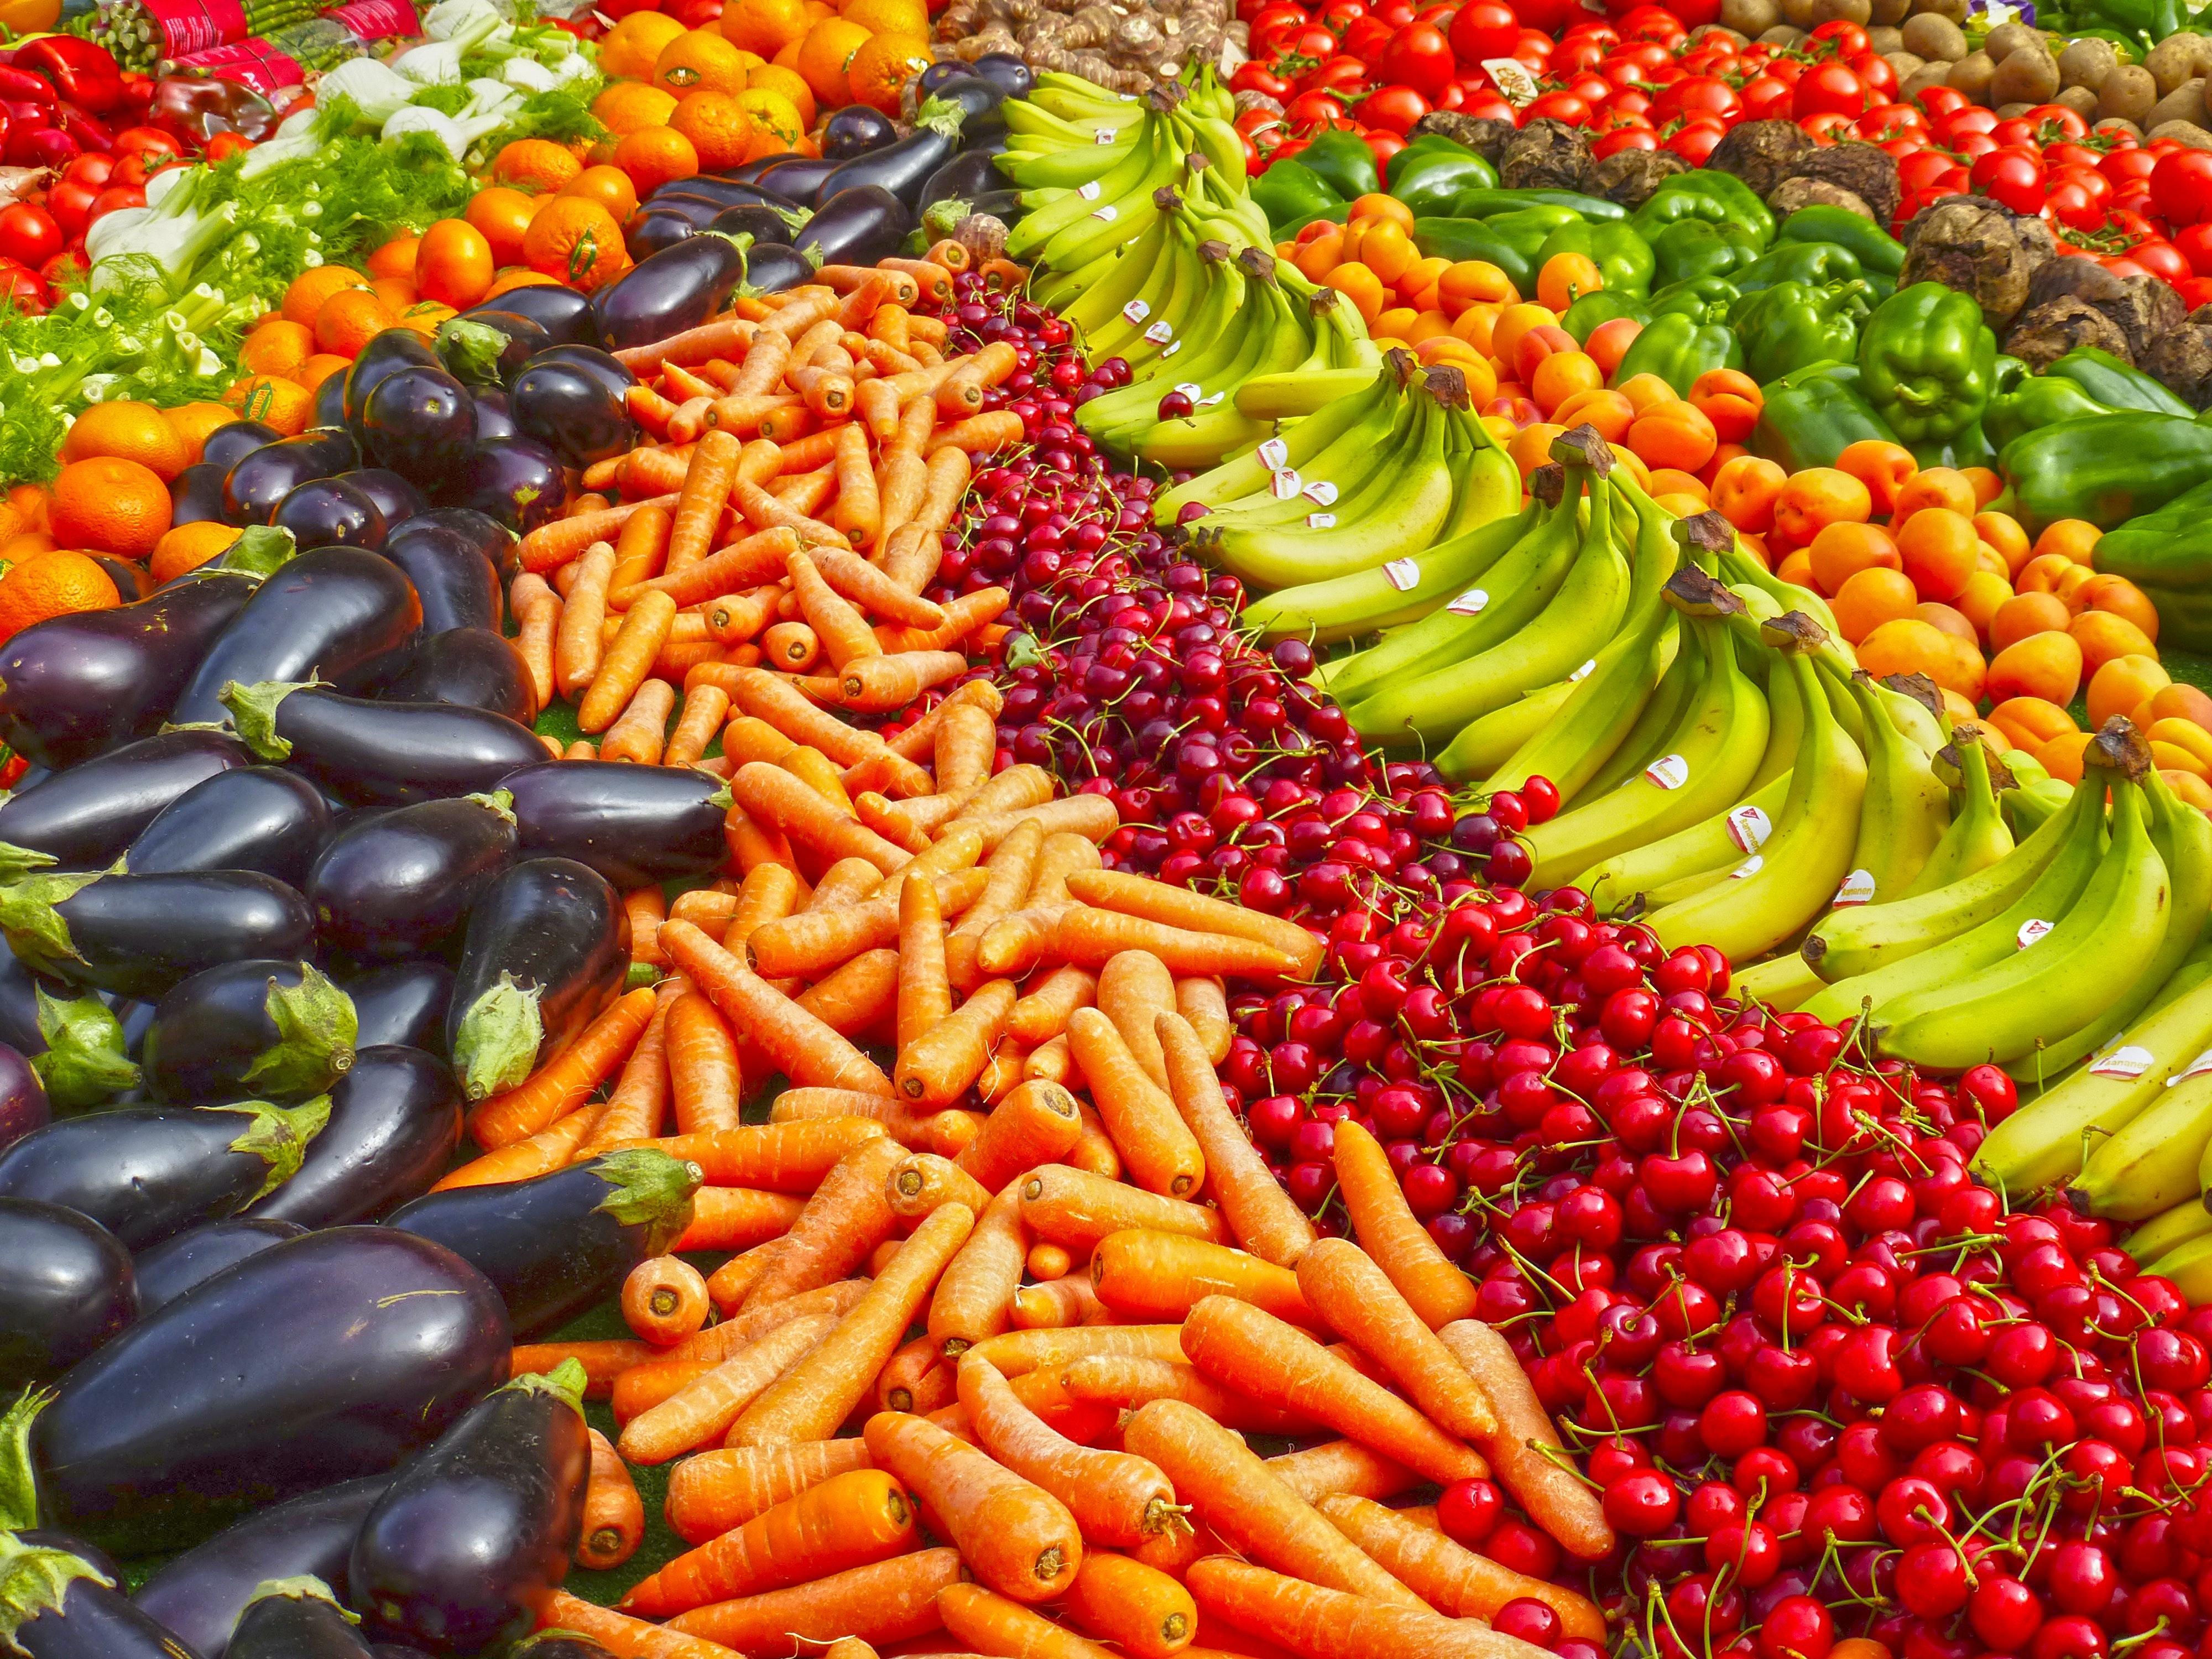 500 great vegetables photos pexels free stock photos